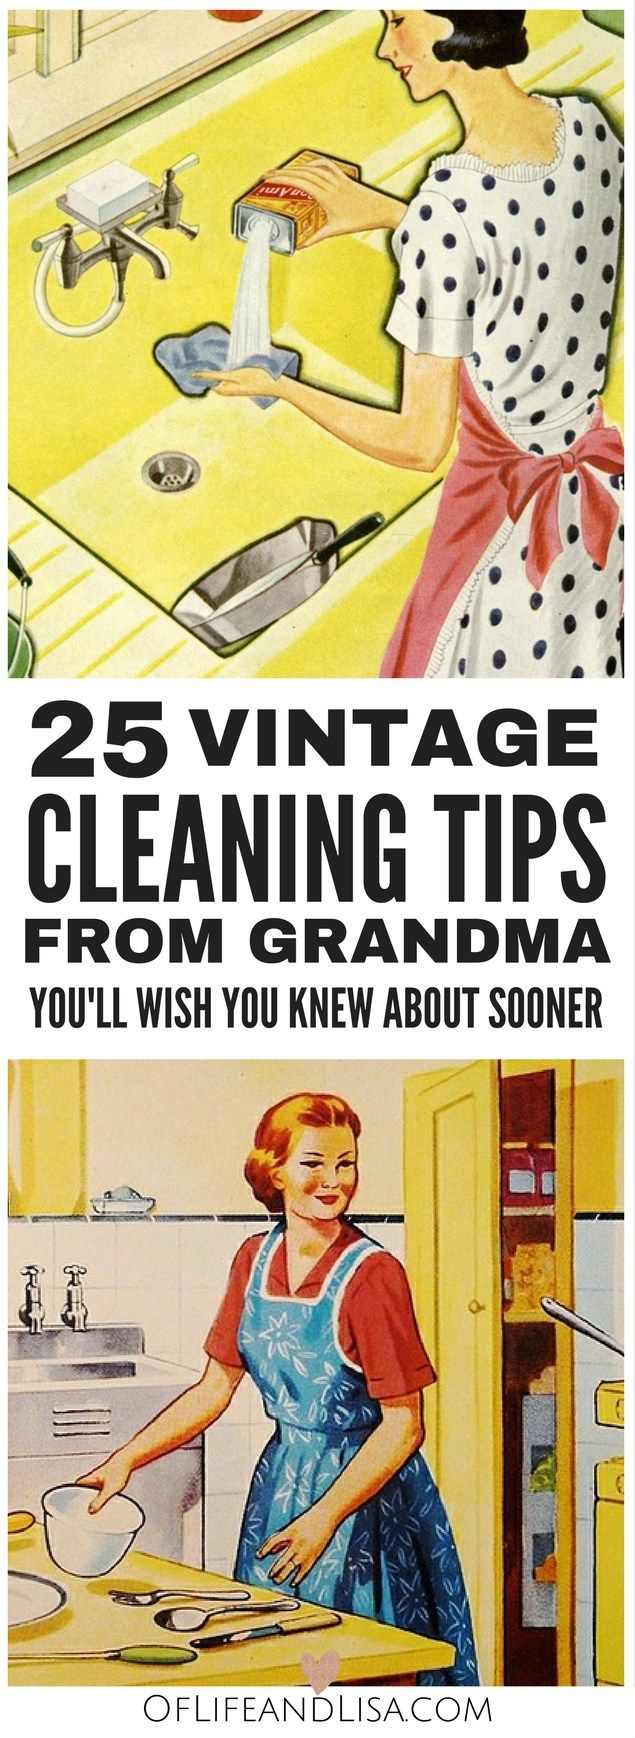 '25 Housekeeping Secrets from Grandma You'll Regret Missing...!' (via Of Life and Lisa)